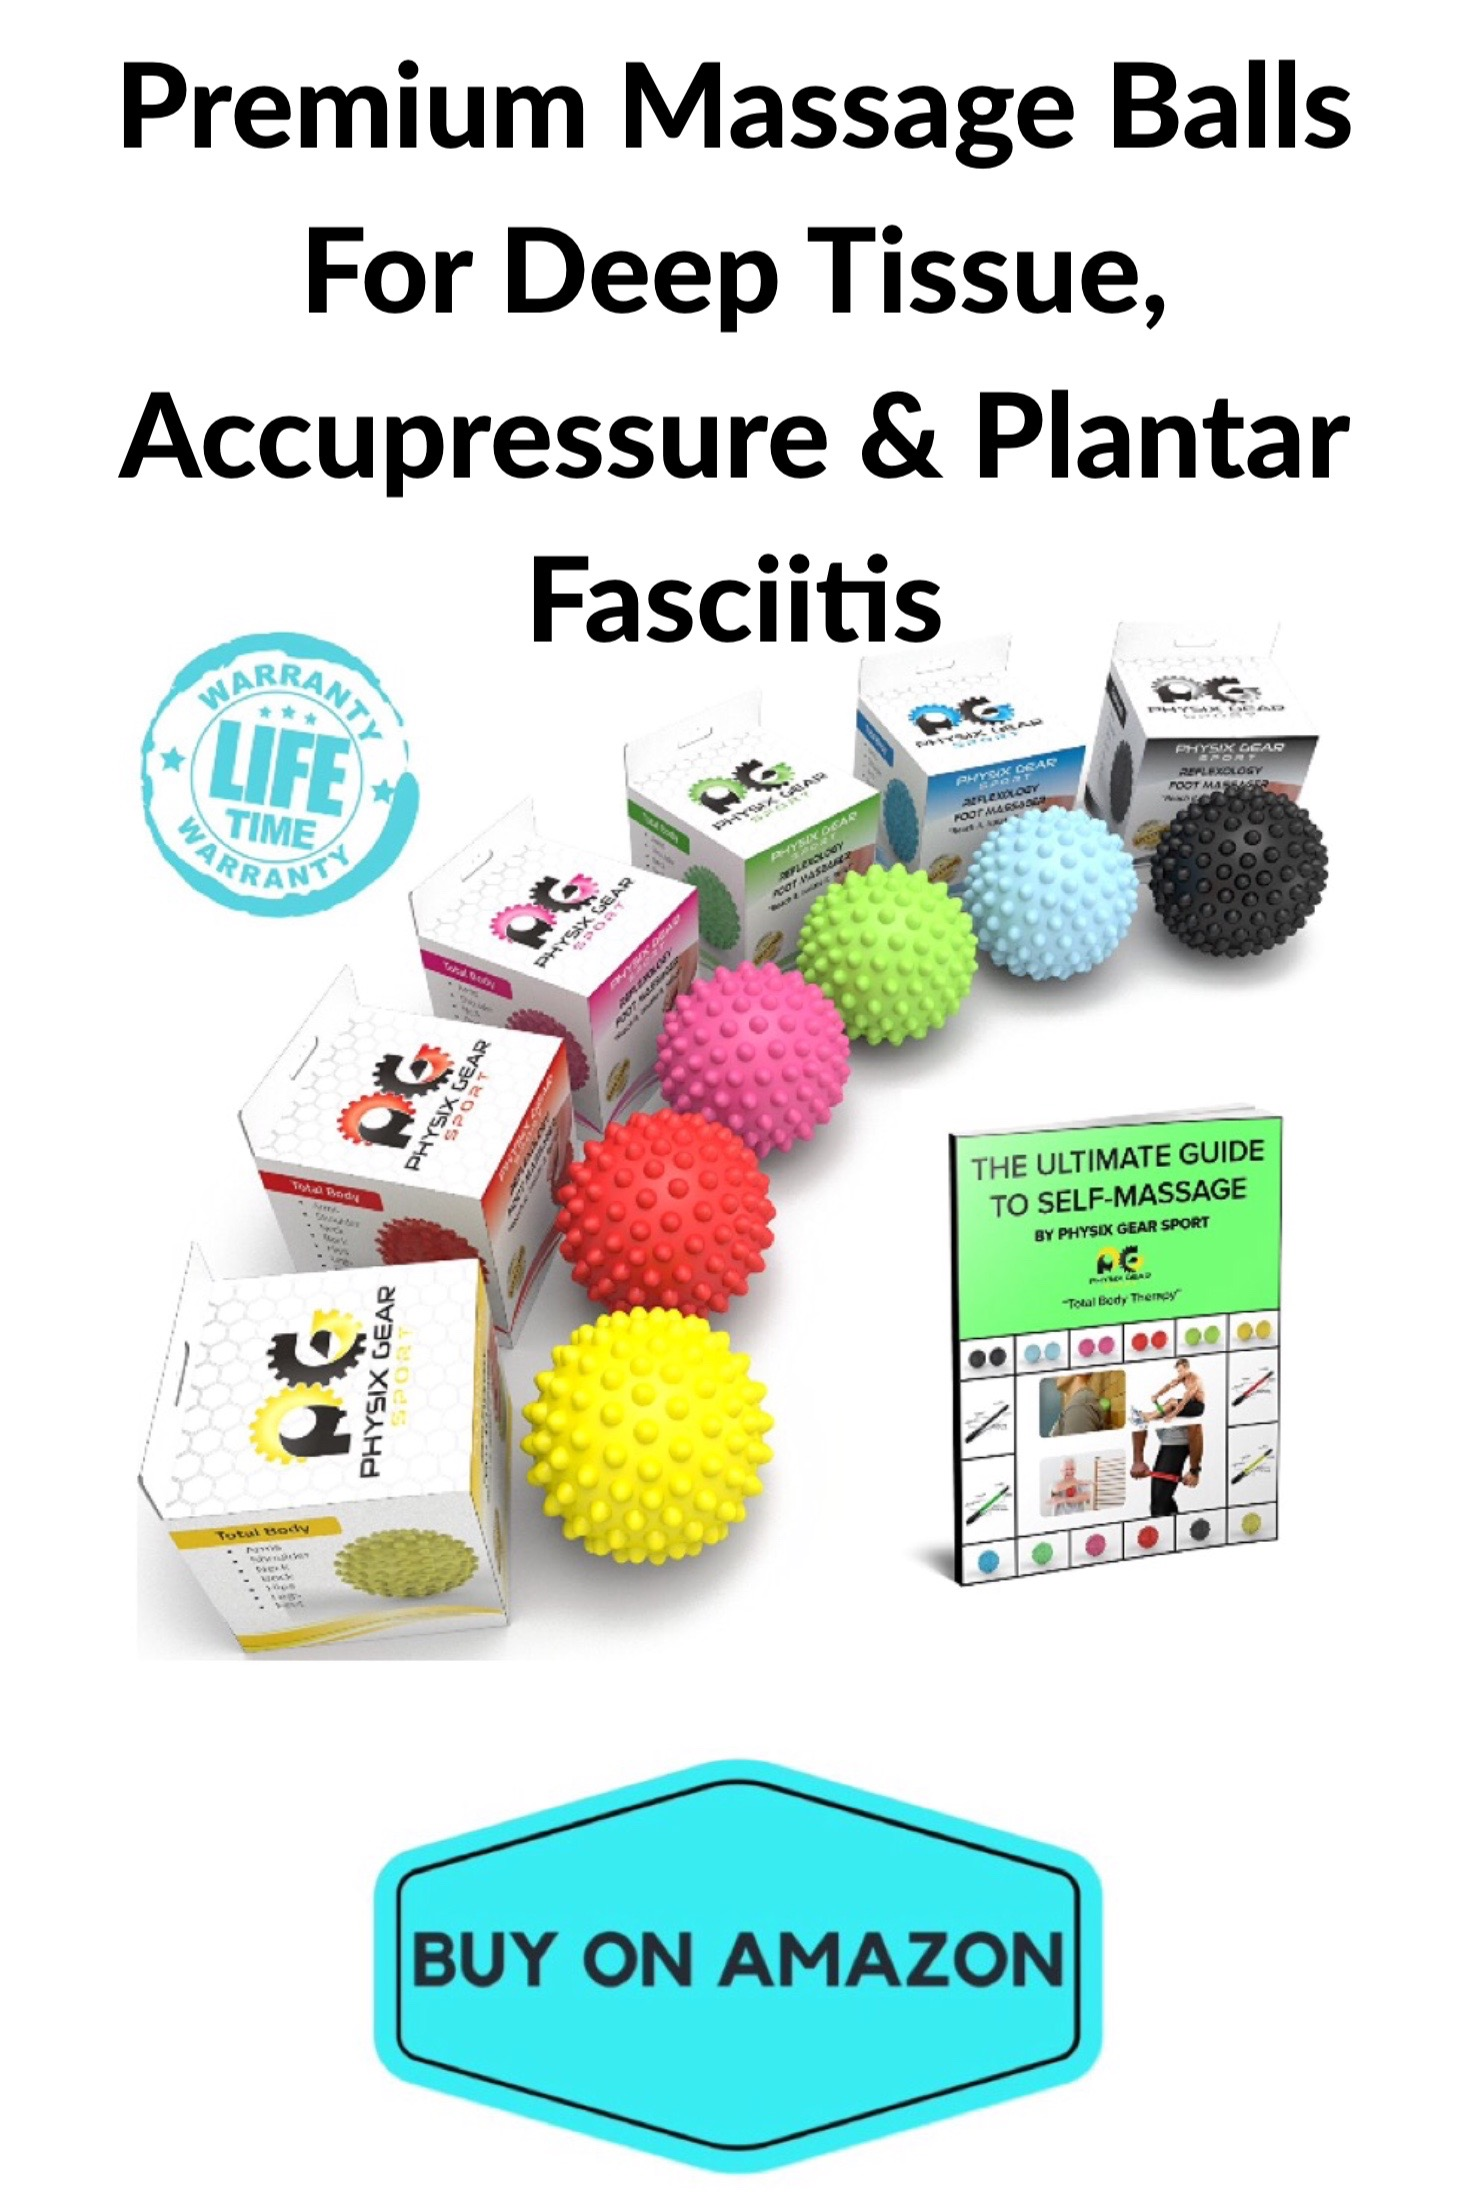 Premium Massage Balls For Deep Tissue